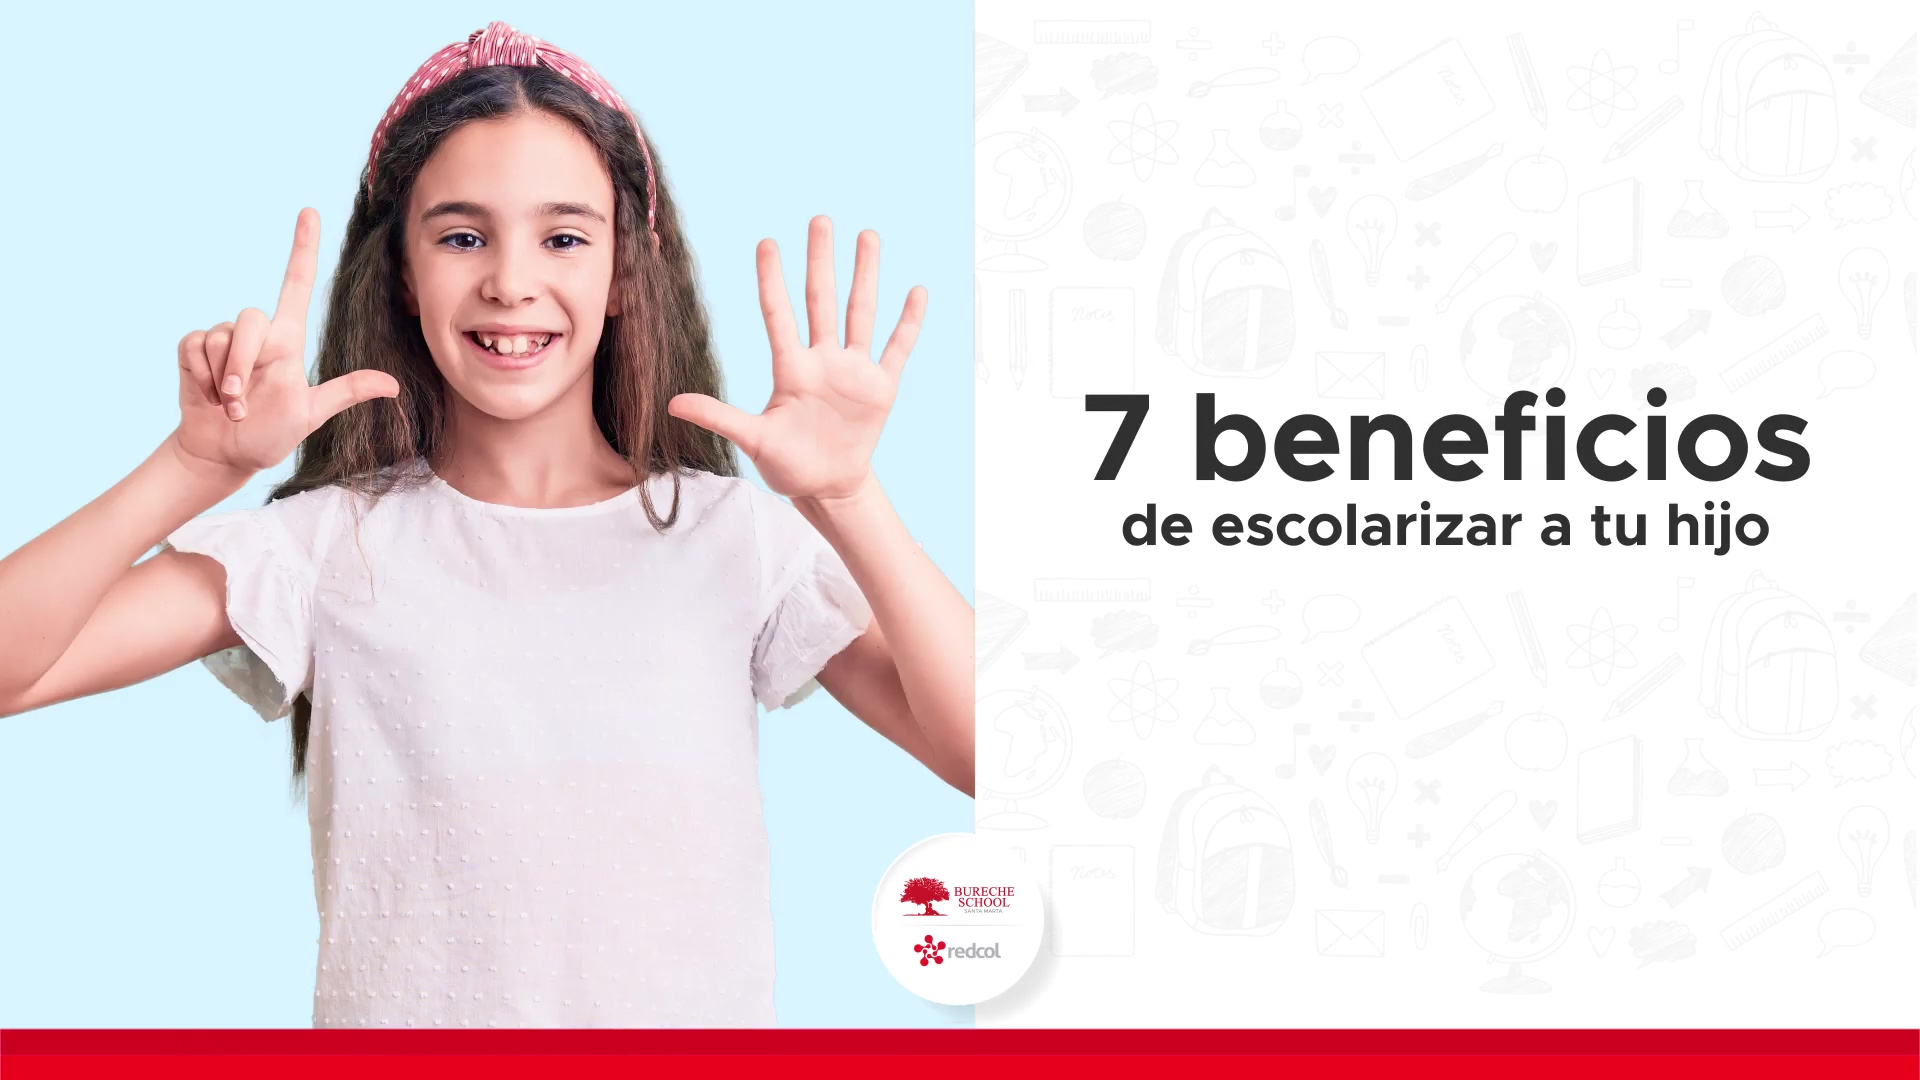 Video-7 Beneficios De Escolarizar A Tu Hijo-1.m4v